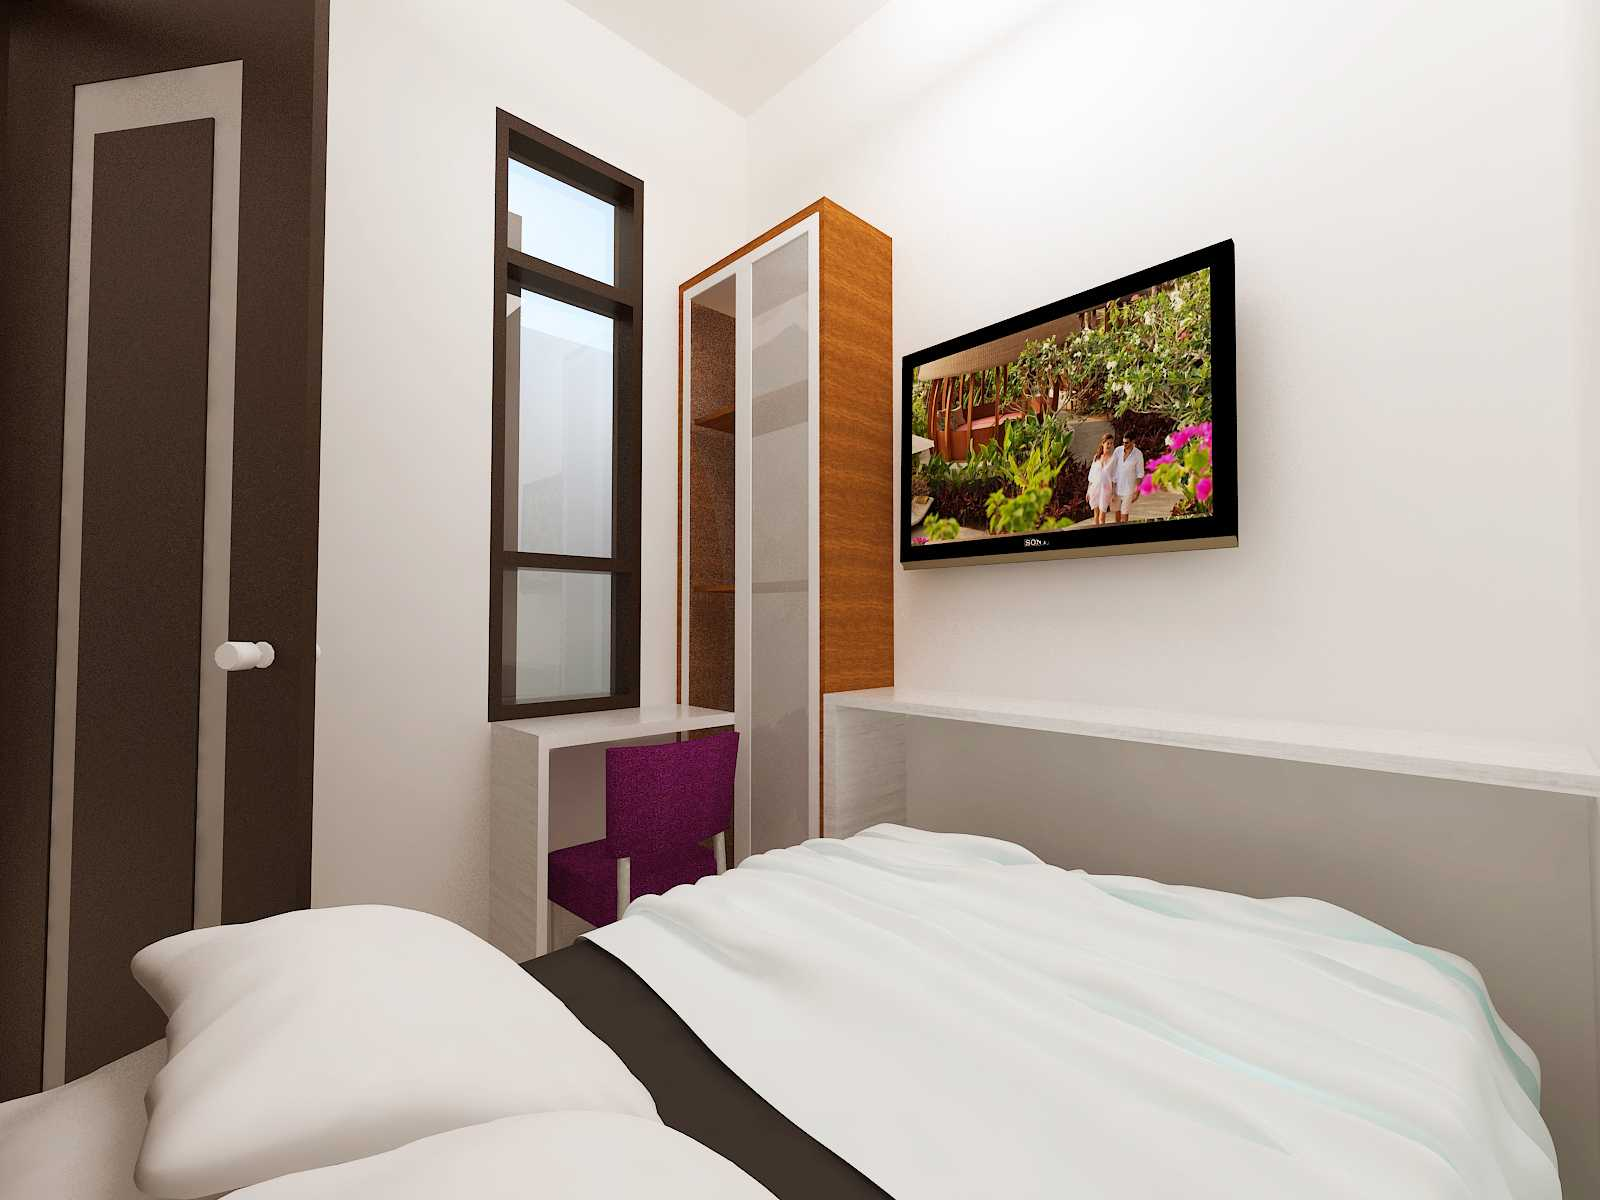 Archdesignbuild7 Rumah Tipe 36 Di Jatihandap Jatihandap, Bandung Jatihandap, Bandung Bedroom Minimalis  20132